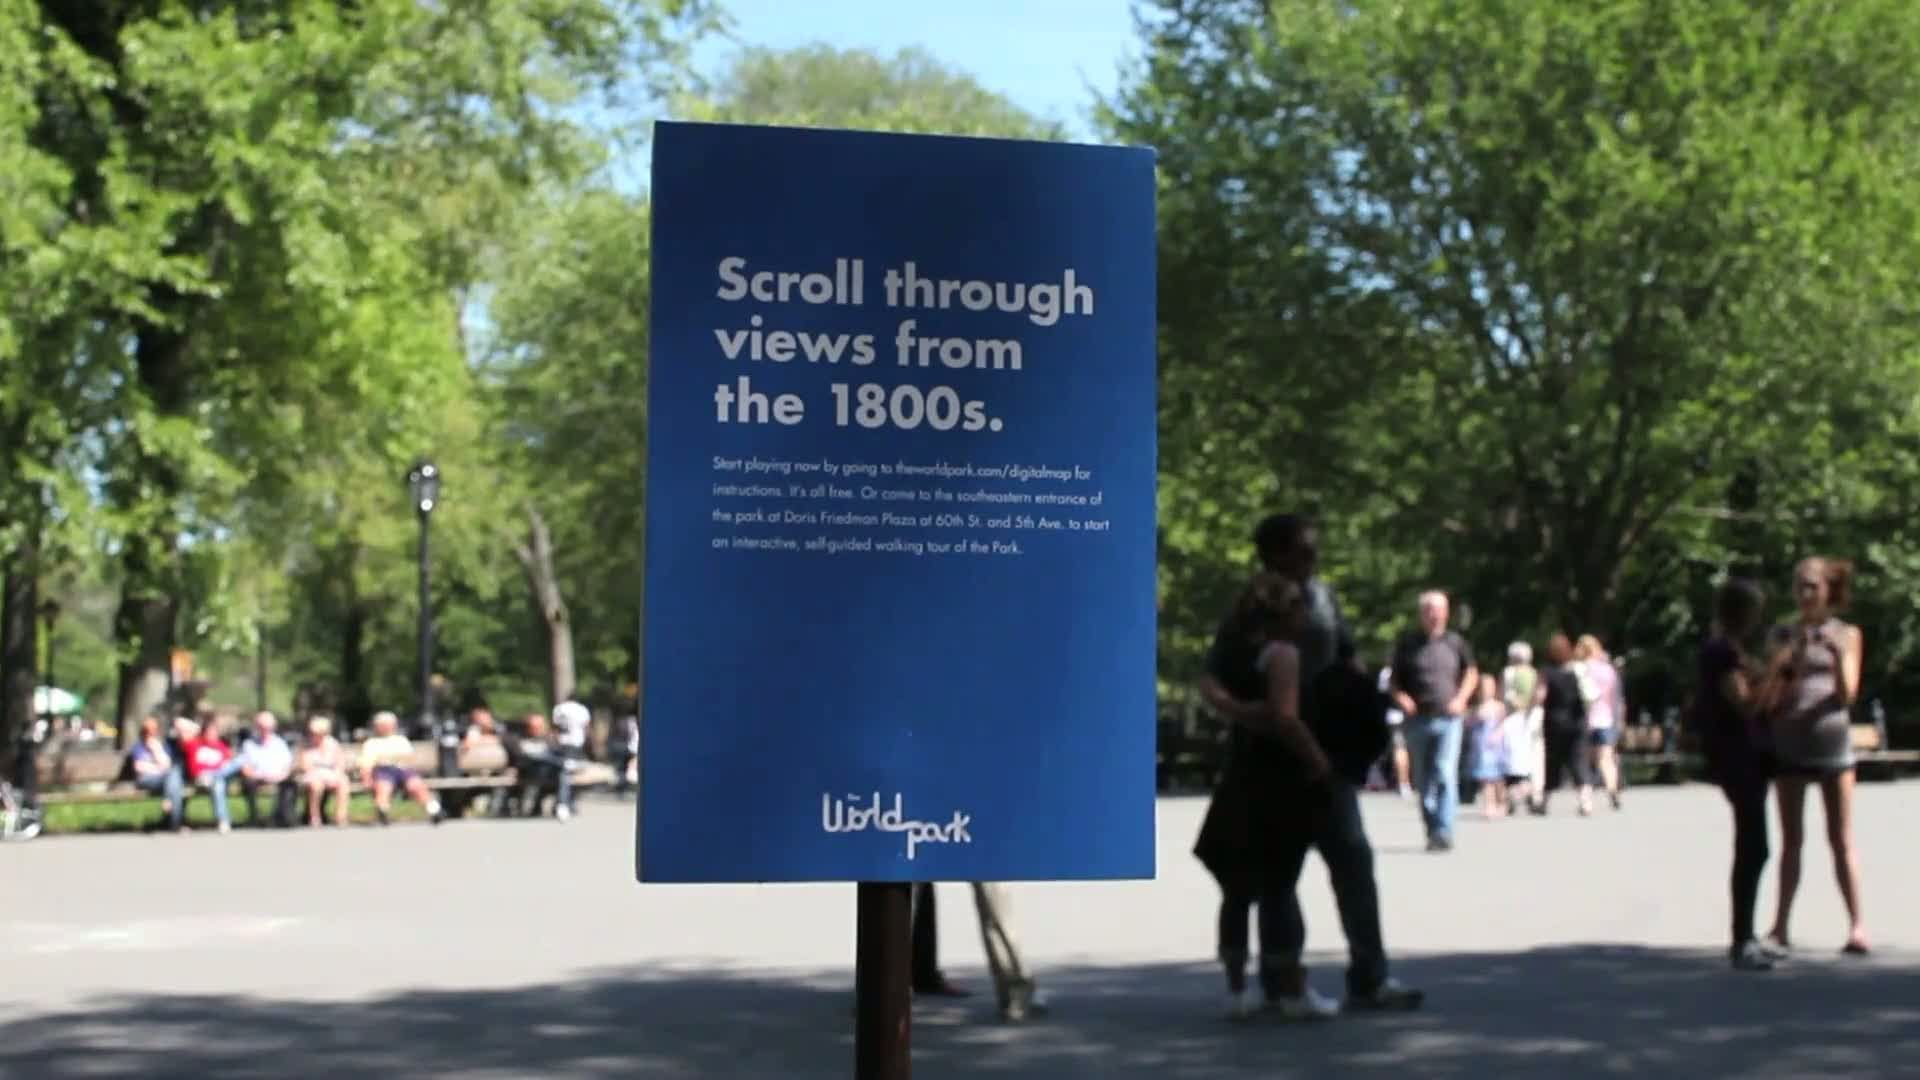 park campaign - Google Search